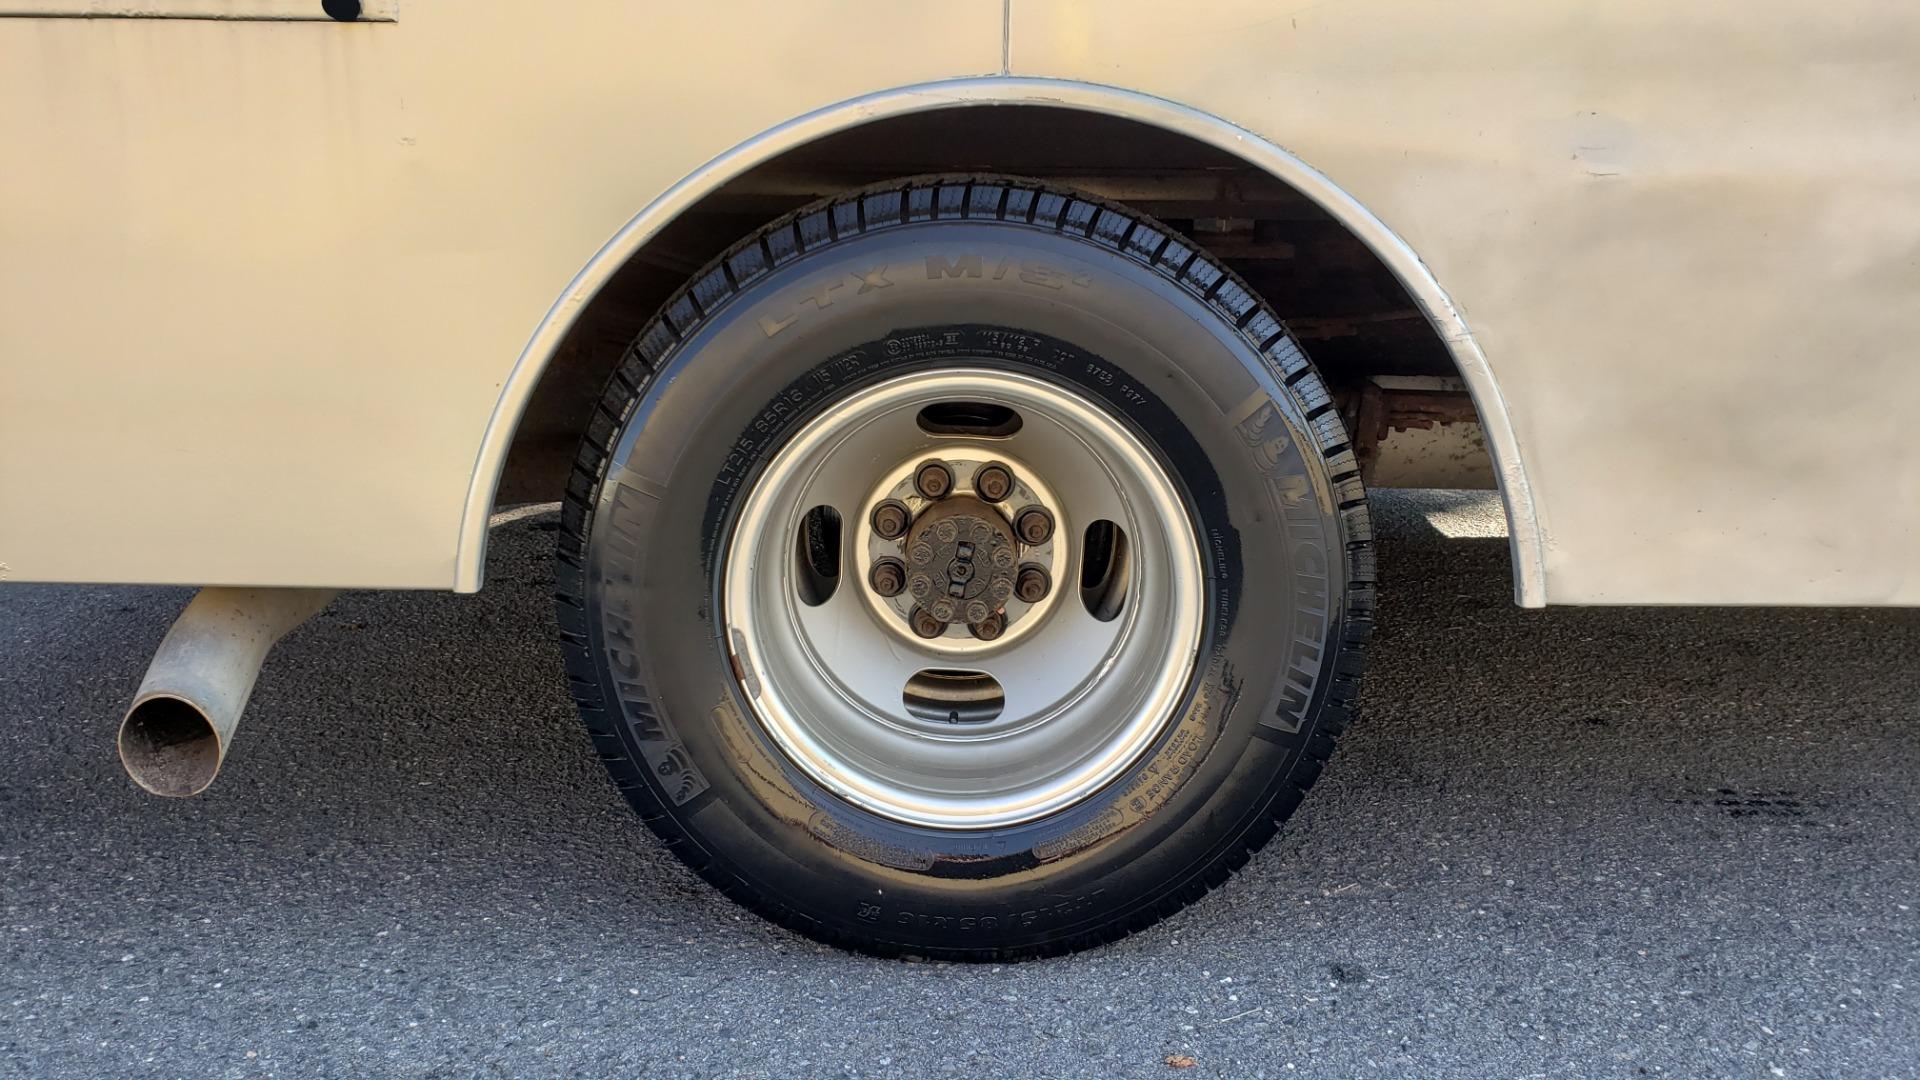 Used 2005 Chevrolet SILVERADO 3500 DRW / 4WD / REG CAB / 6.6L DURAMAX / DOOMSDAY PREPPER for sale $21,499 at Formula Imports in Charlotte NC 28227 55